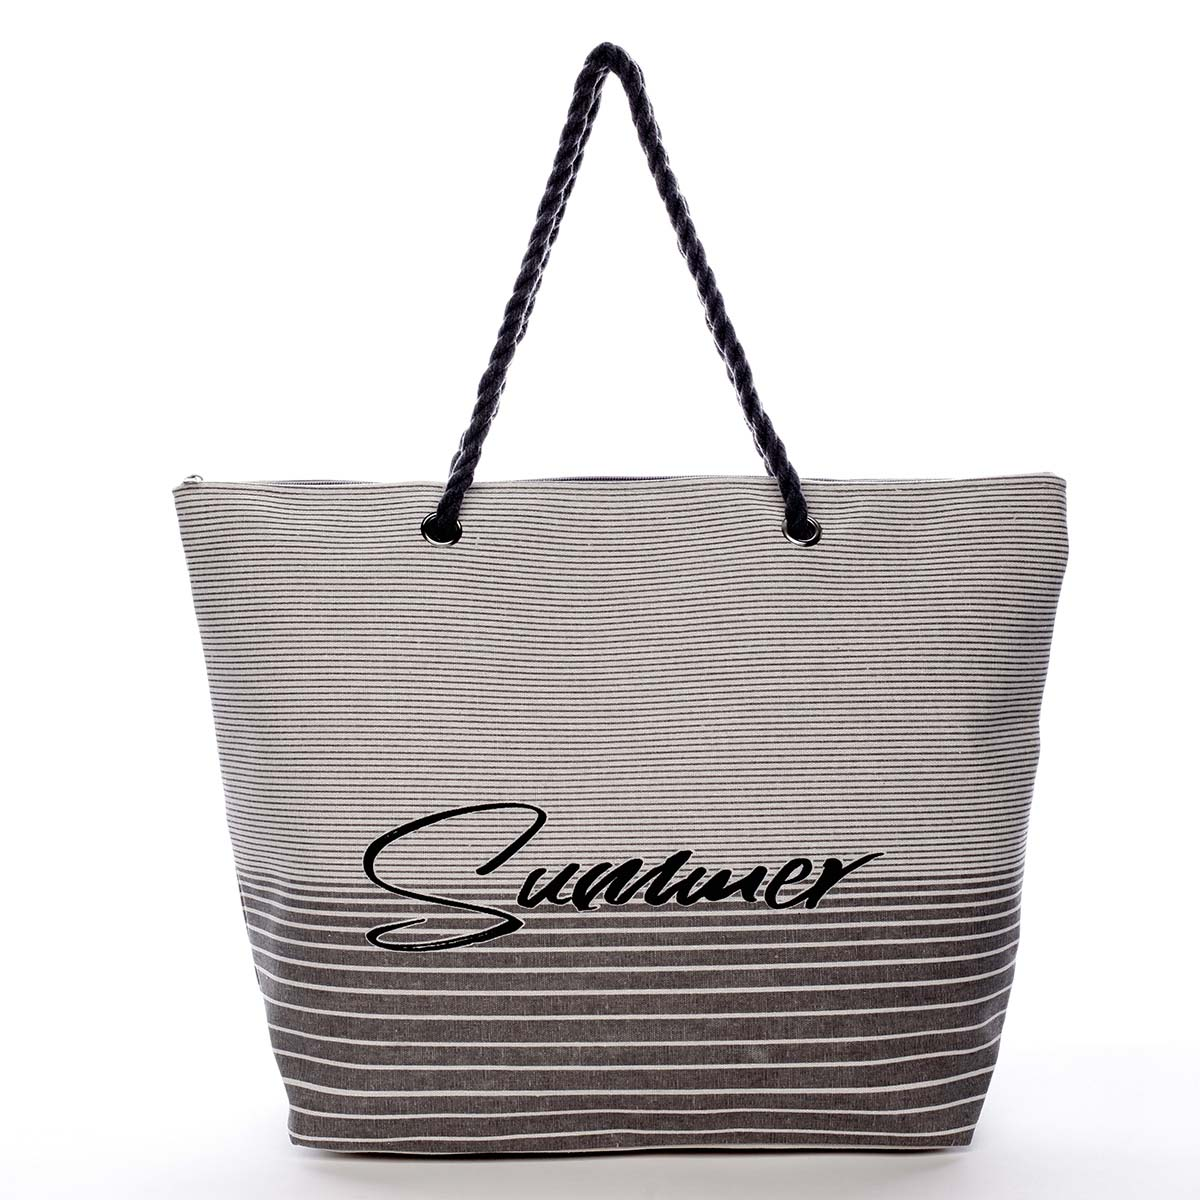 Módna plážová taška sivá - Delami Summer